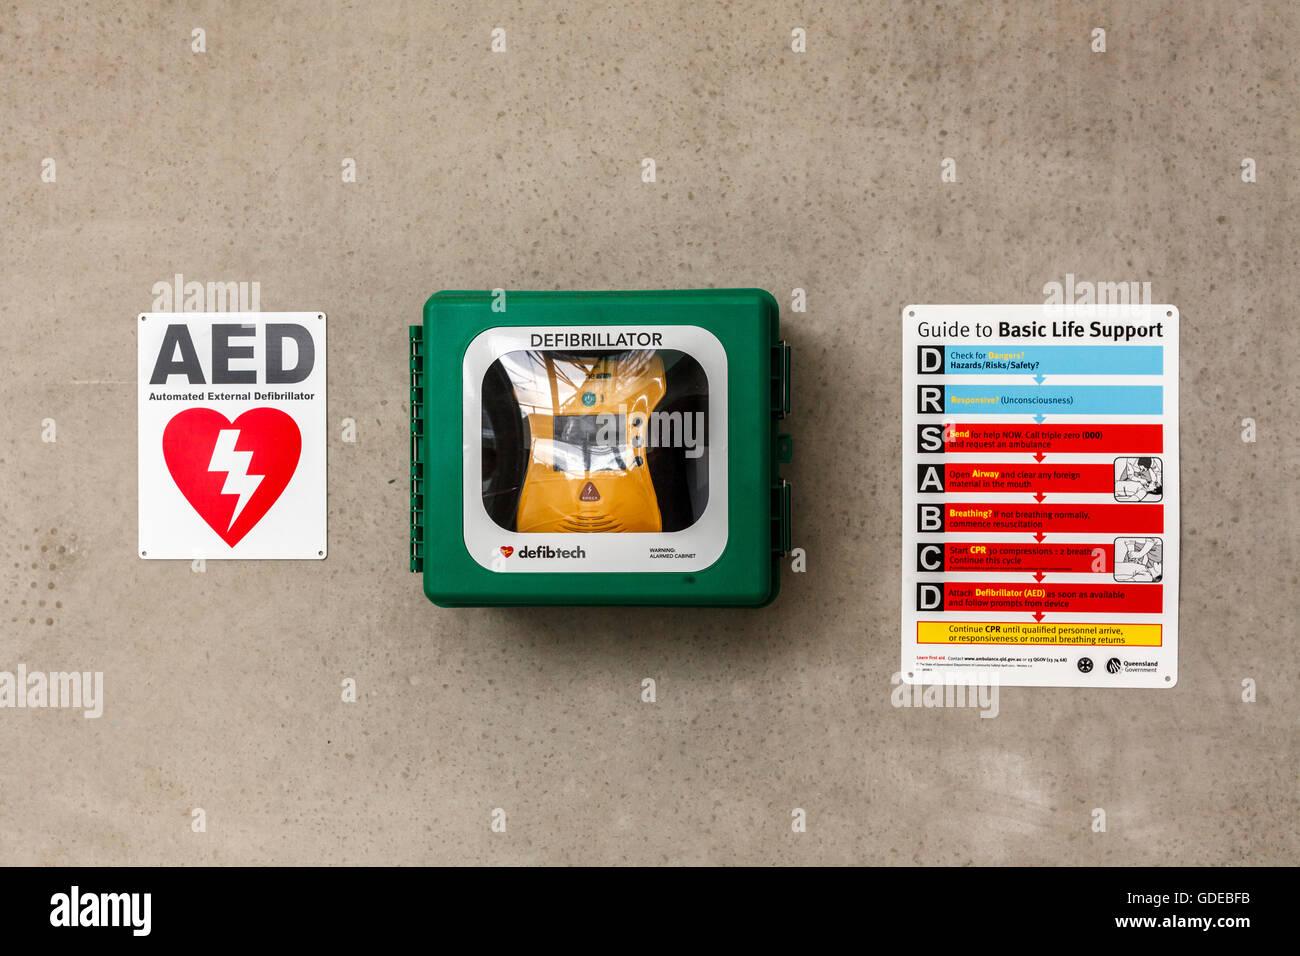 First Aid defiblirater, Brisbane airport railway station, Queensland, Australia - Stock Image